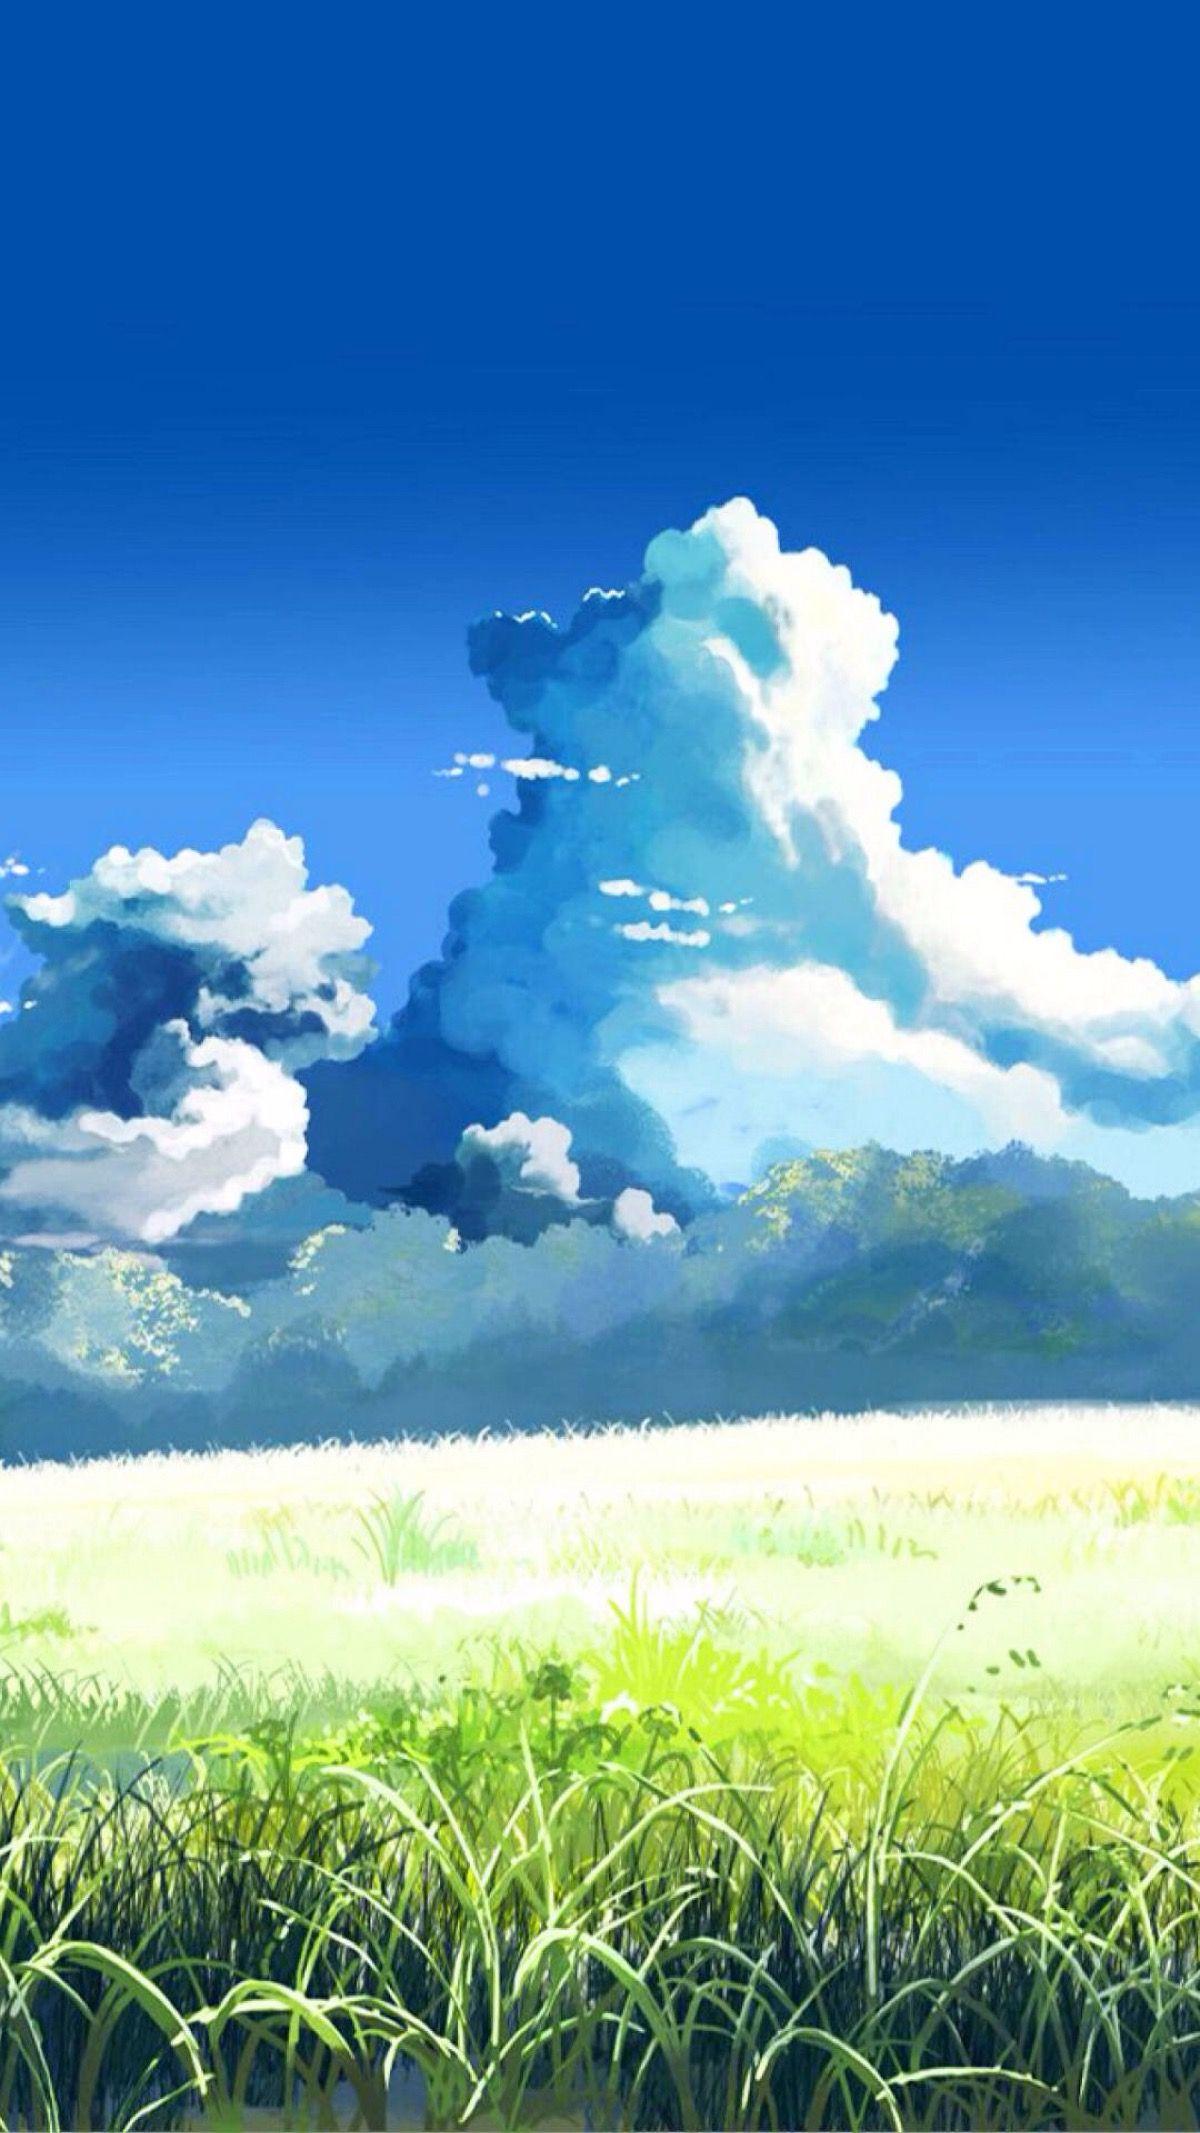 Paesaggi おしゃれまとめの人気アイデア Pinterest Marse アニメの風景 夏イラスト 風景